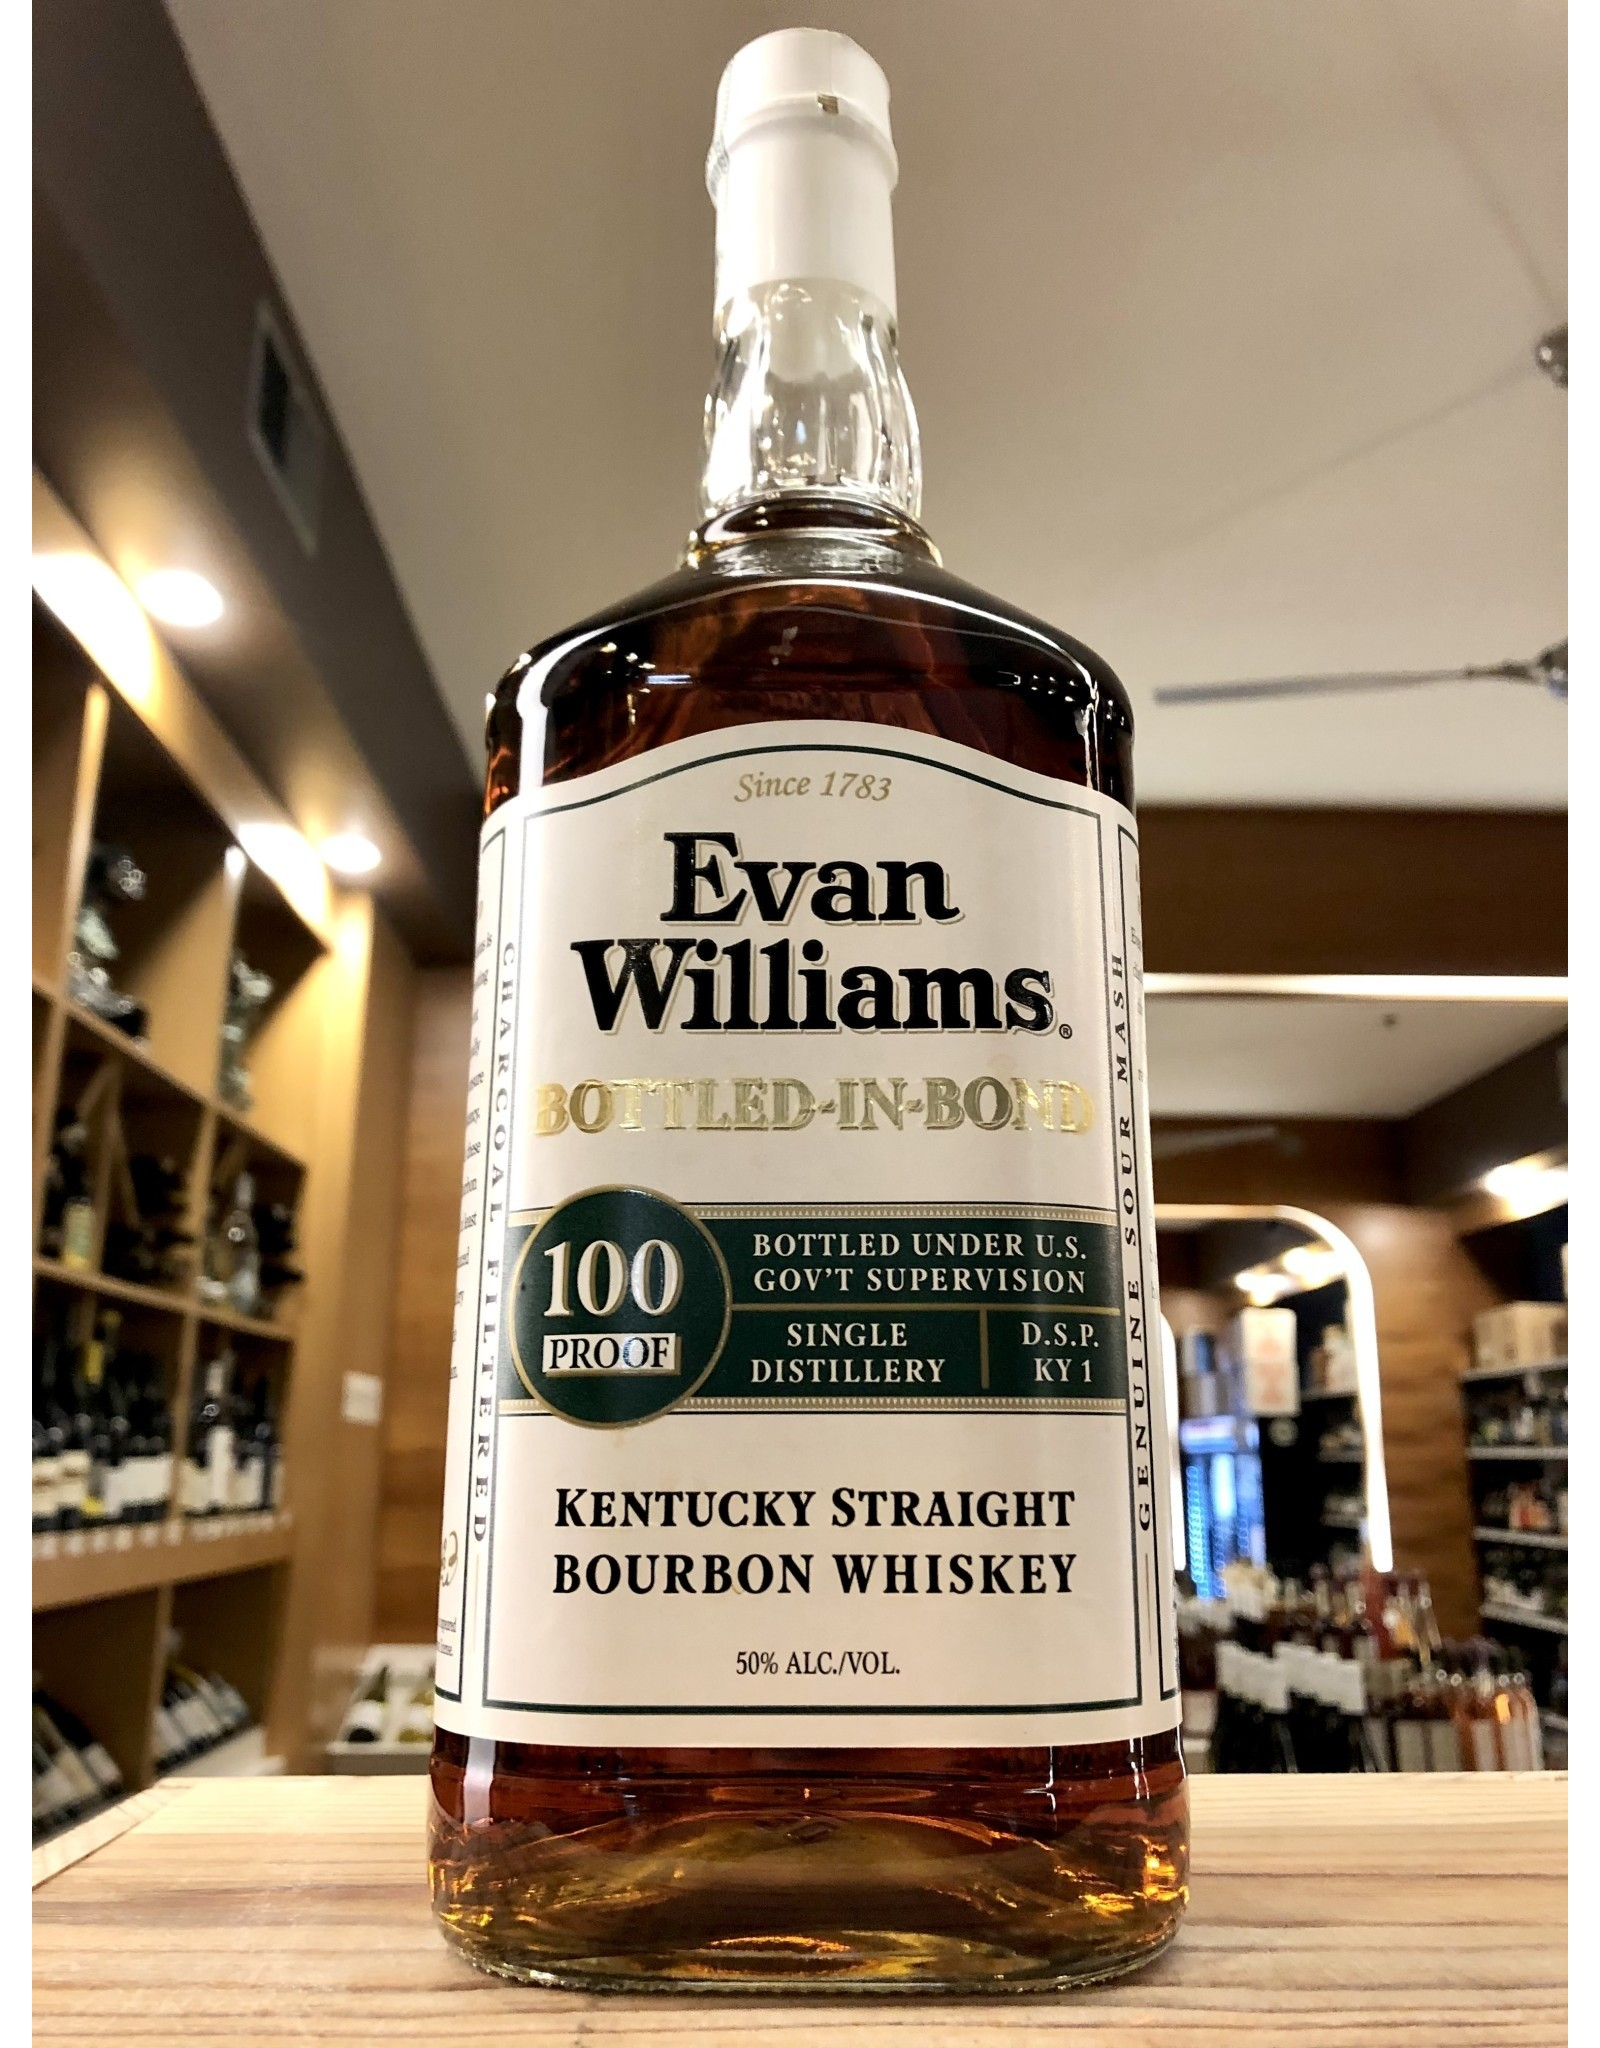 Evan Williams 100 Proof Bourbon - 1.75 Liter